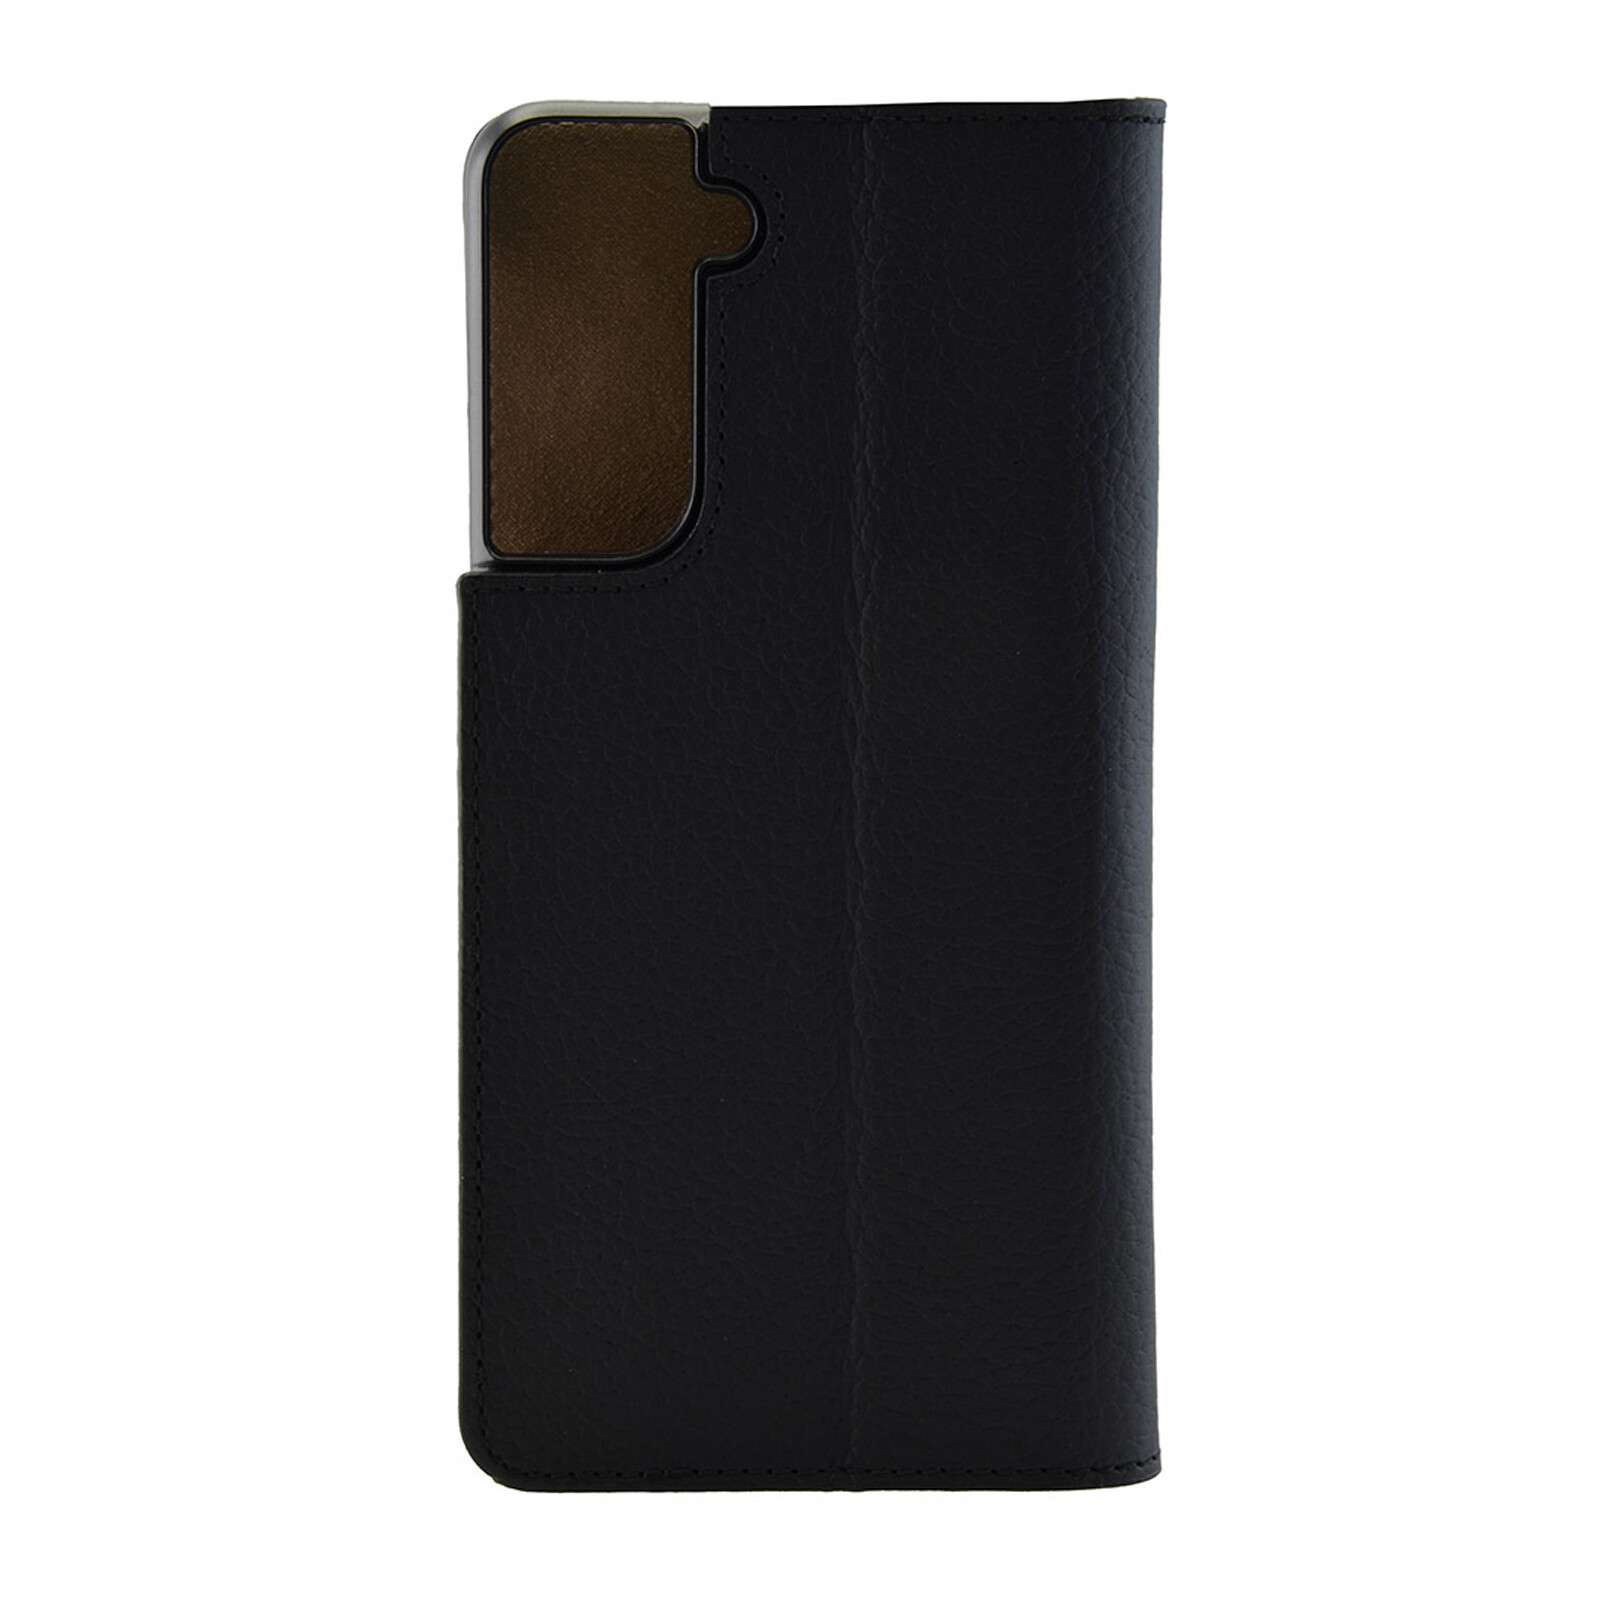 Galeli Book MARC Samsung Galaxy S21+ black